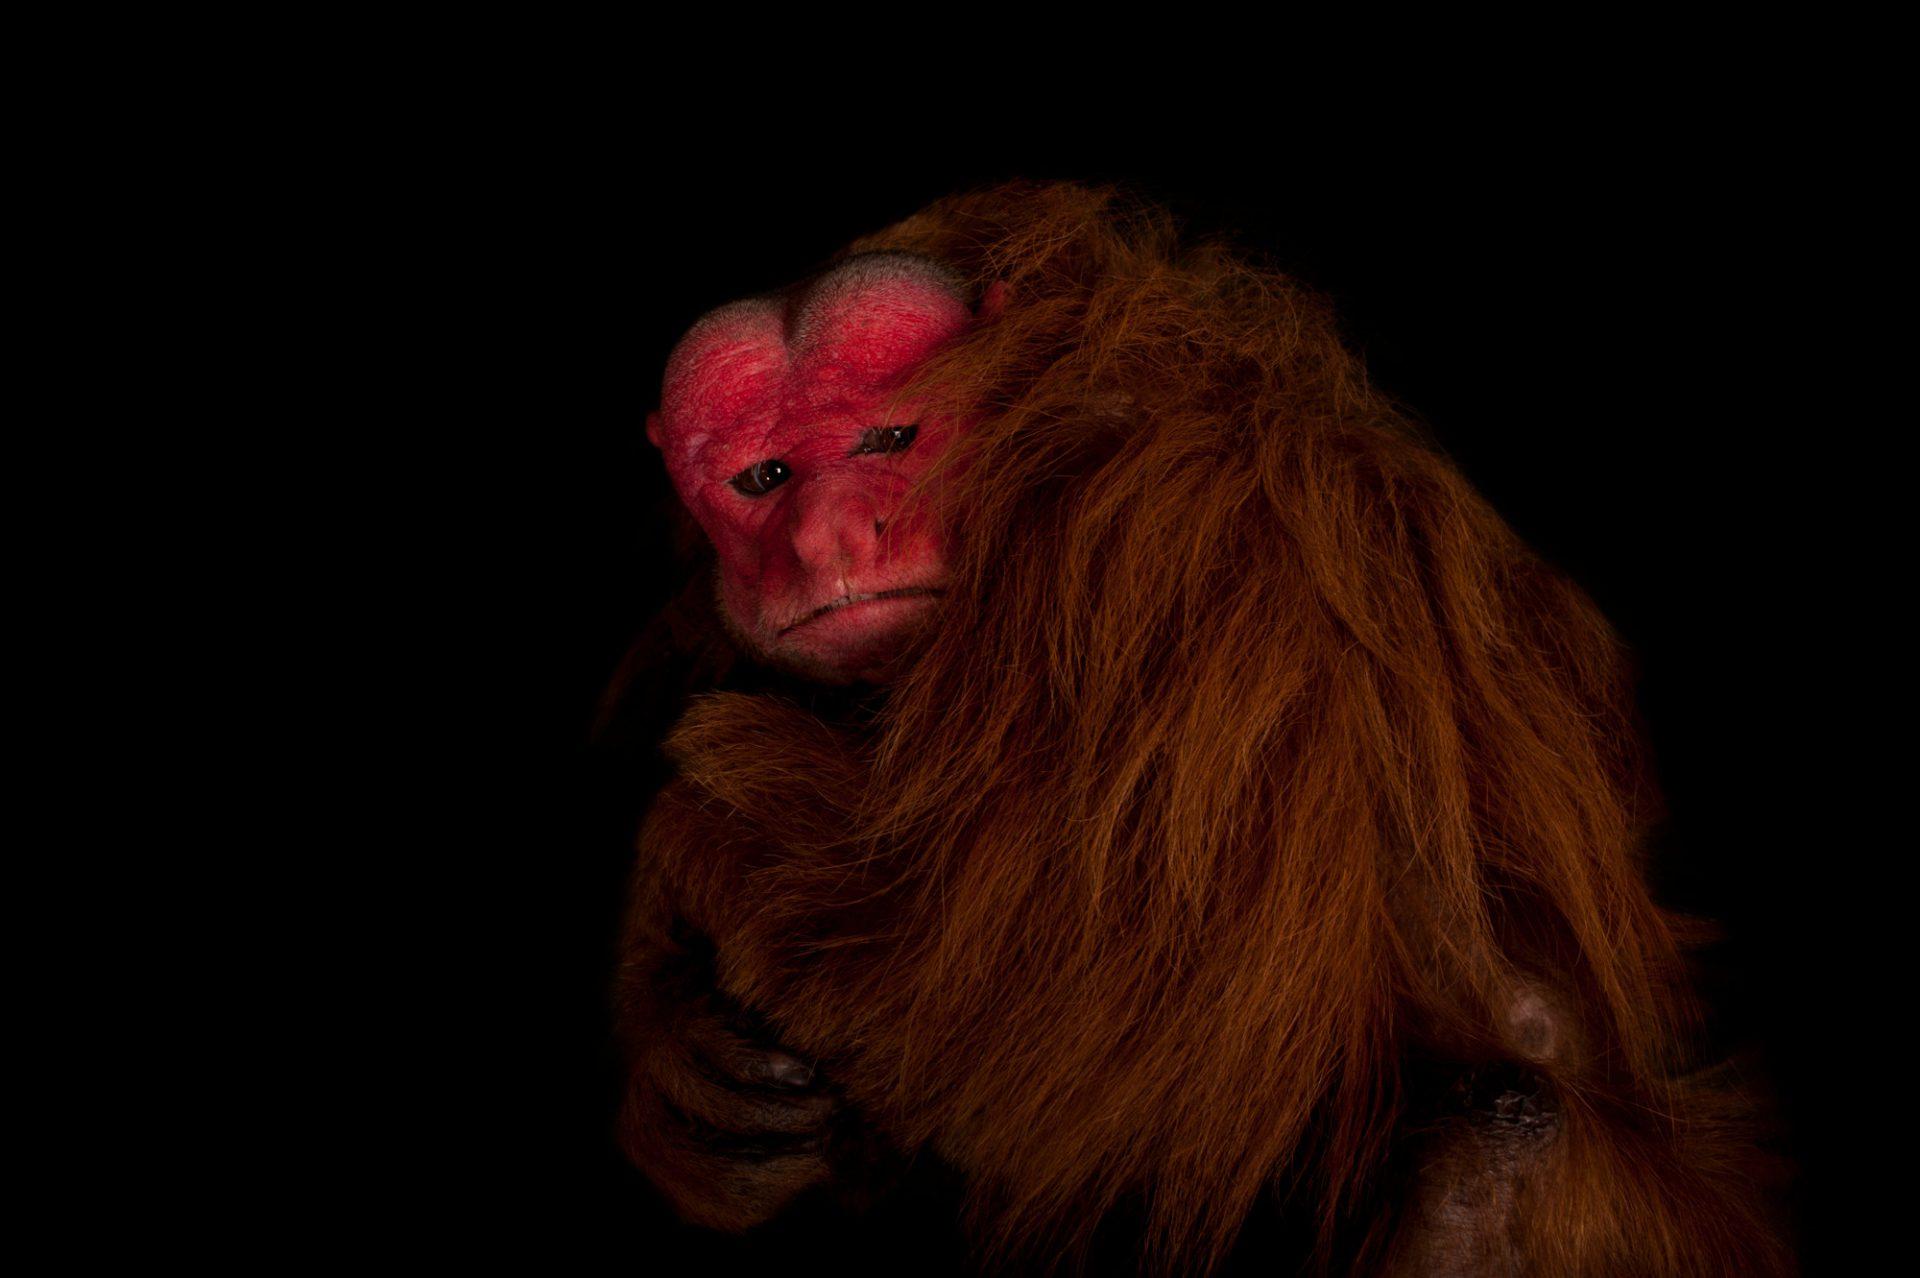 A vulnerable red uakari monkey (Cacajao calvus ucayalii).